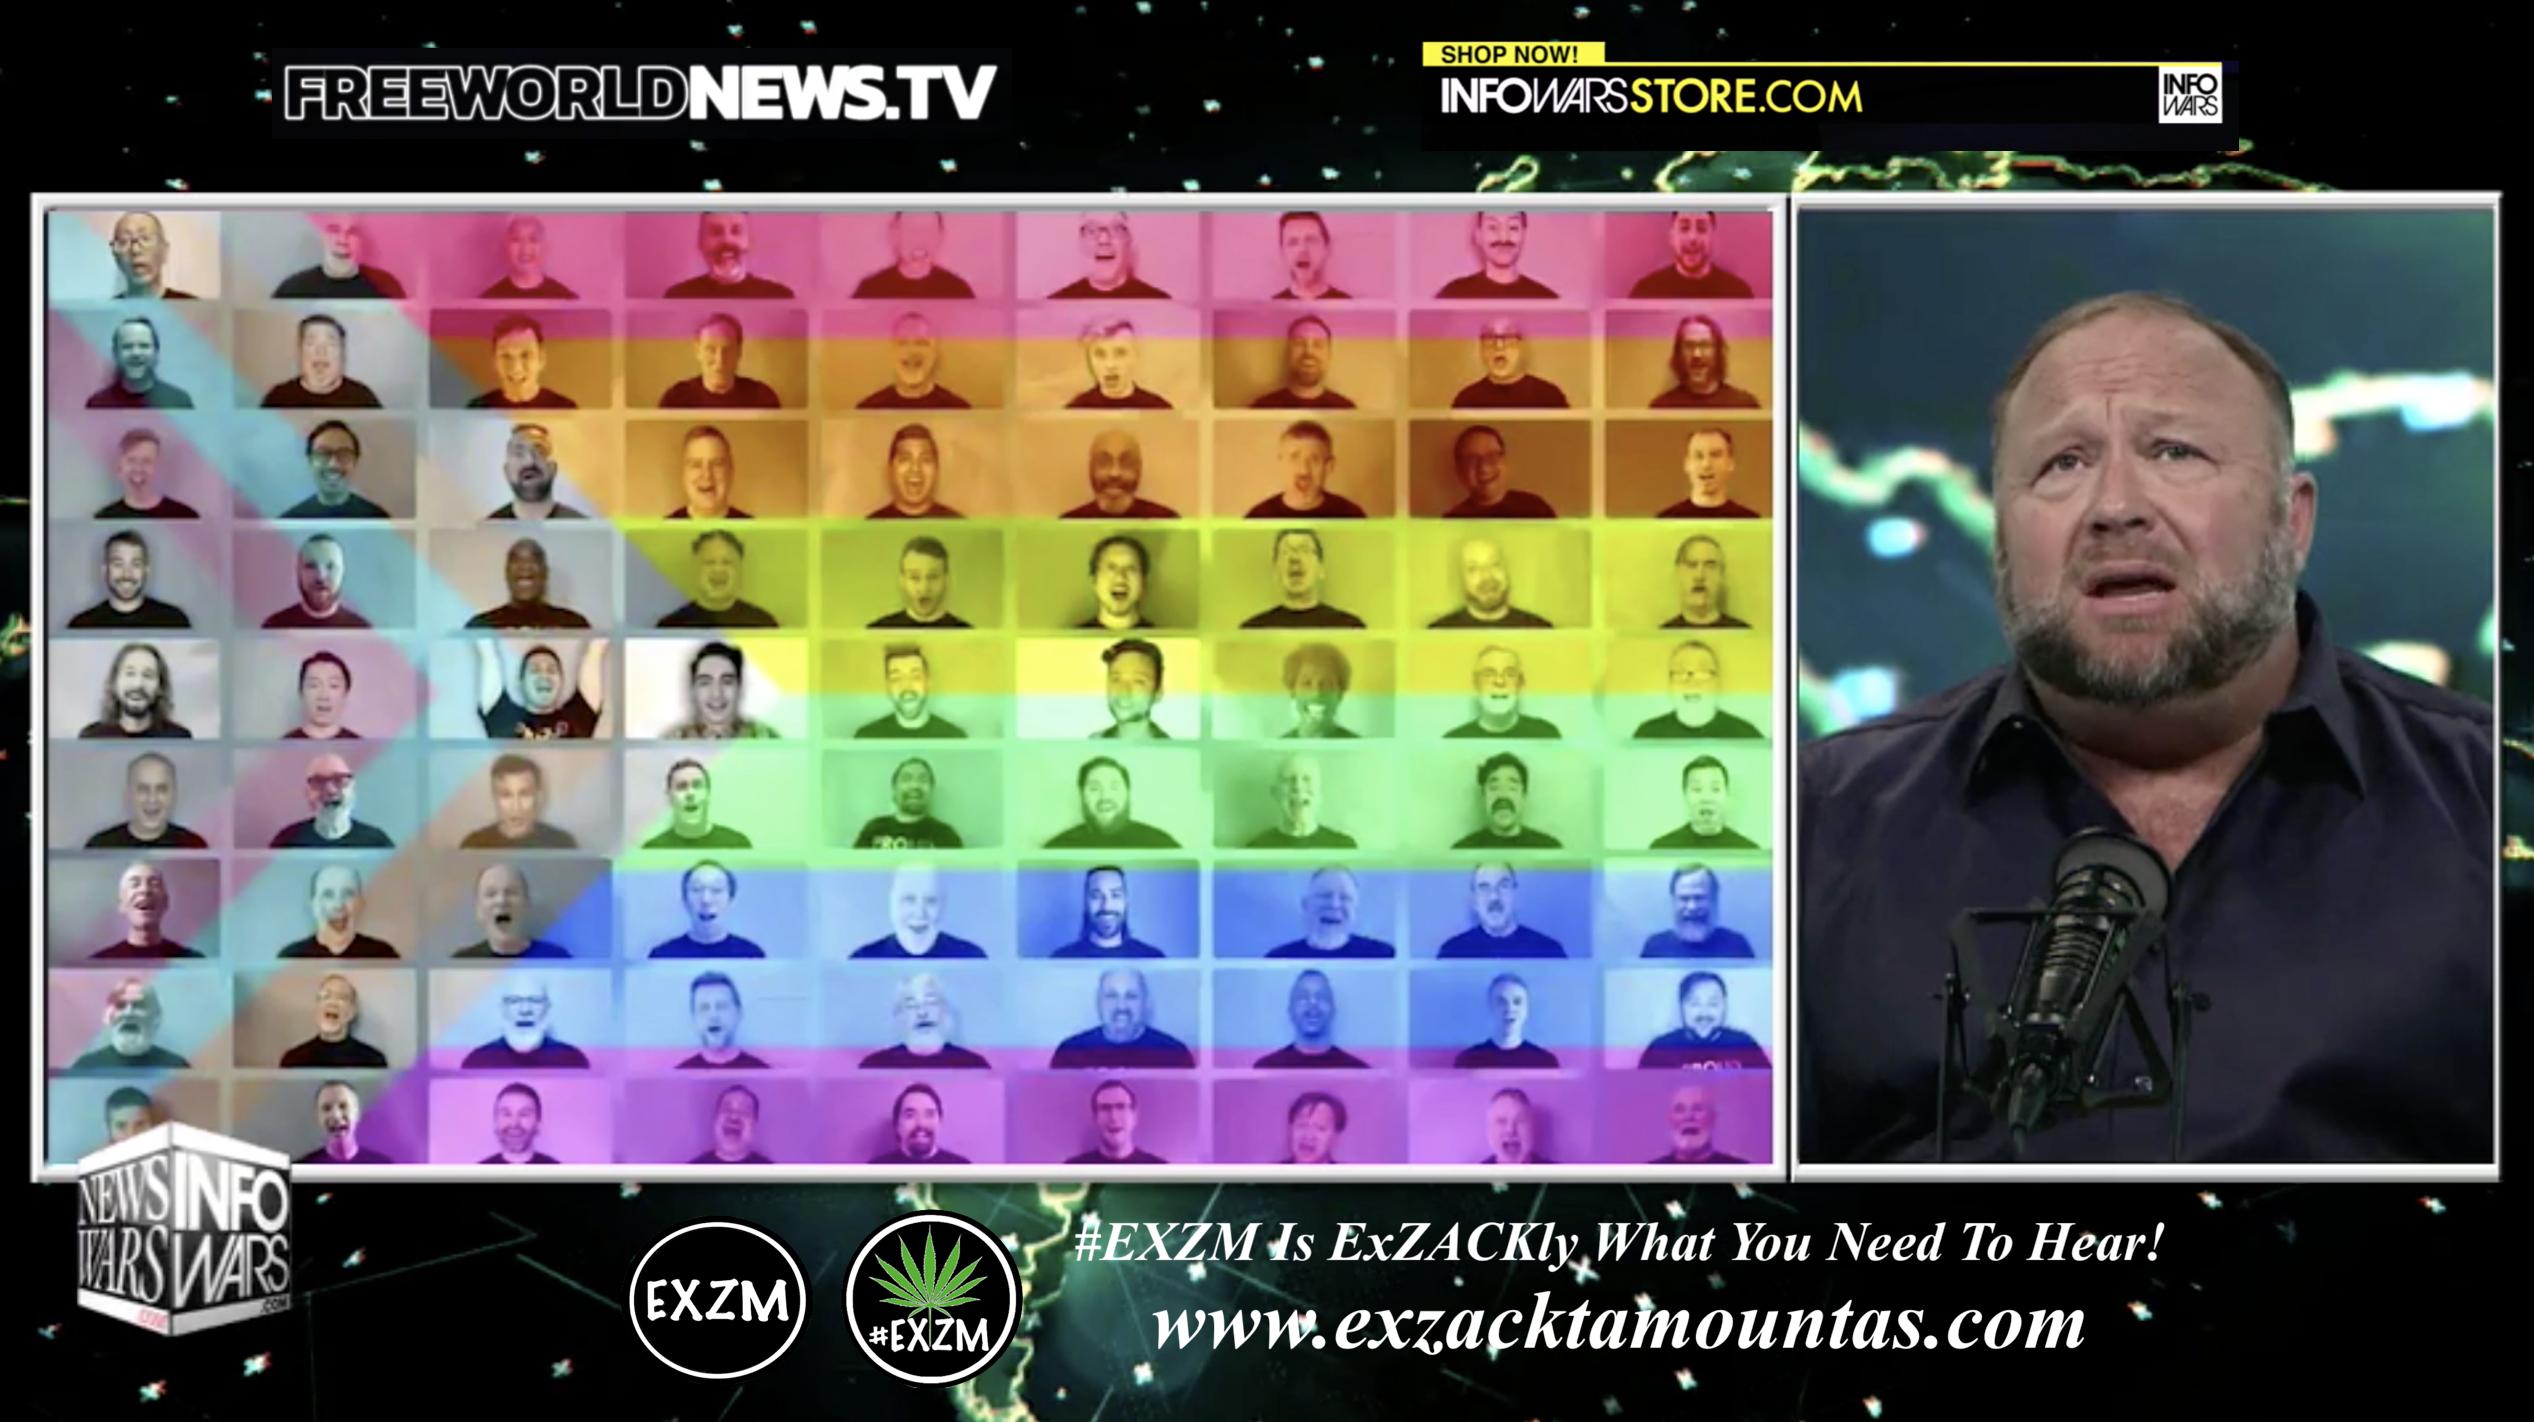 Alex Jones Live In Infowars Studio Free World News TV EXZM Zack Mount July 8th 2021